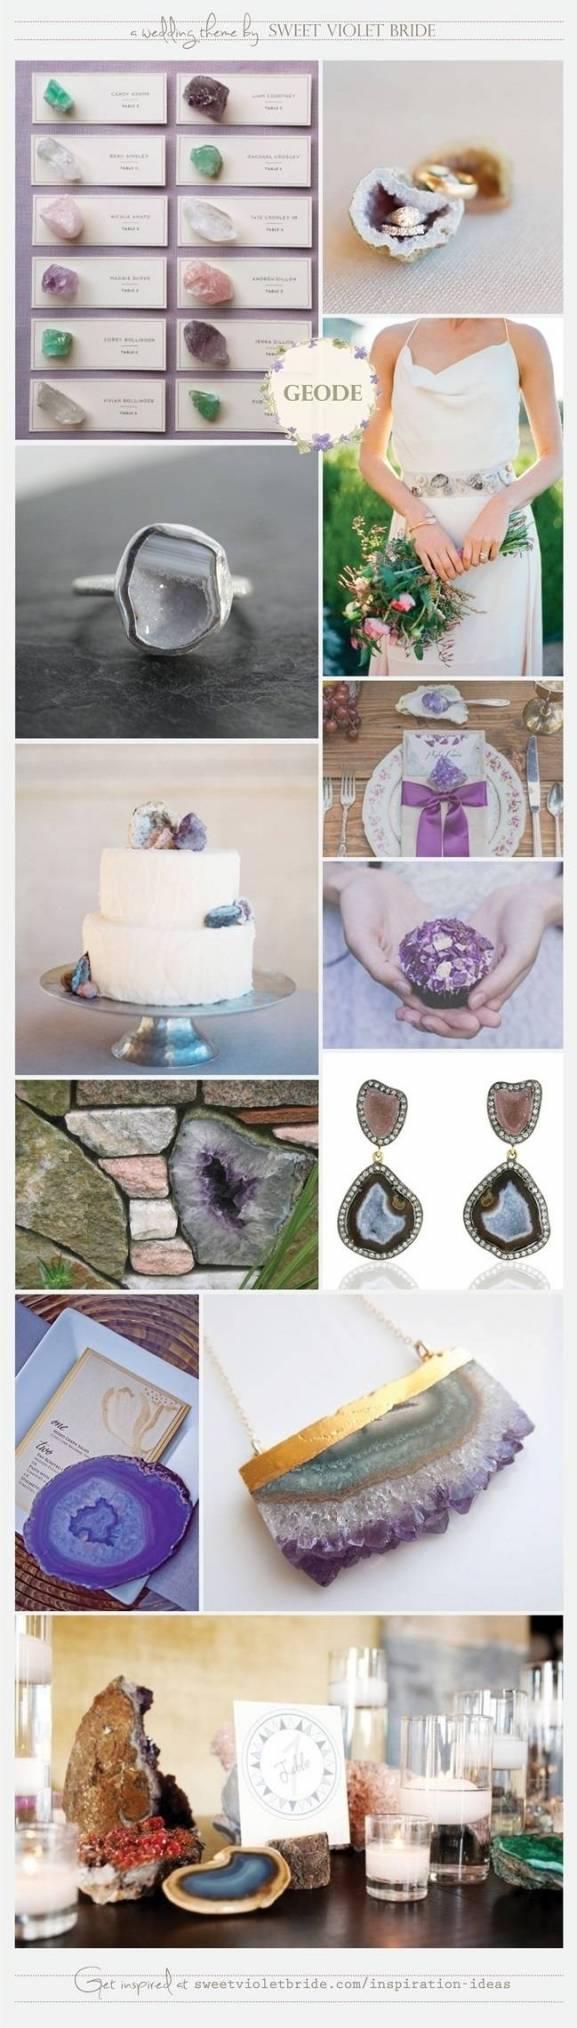 Wedding Inspiration Board #14: Geode